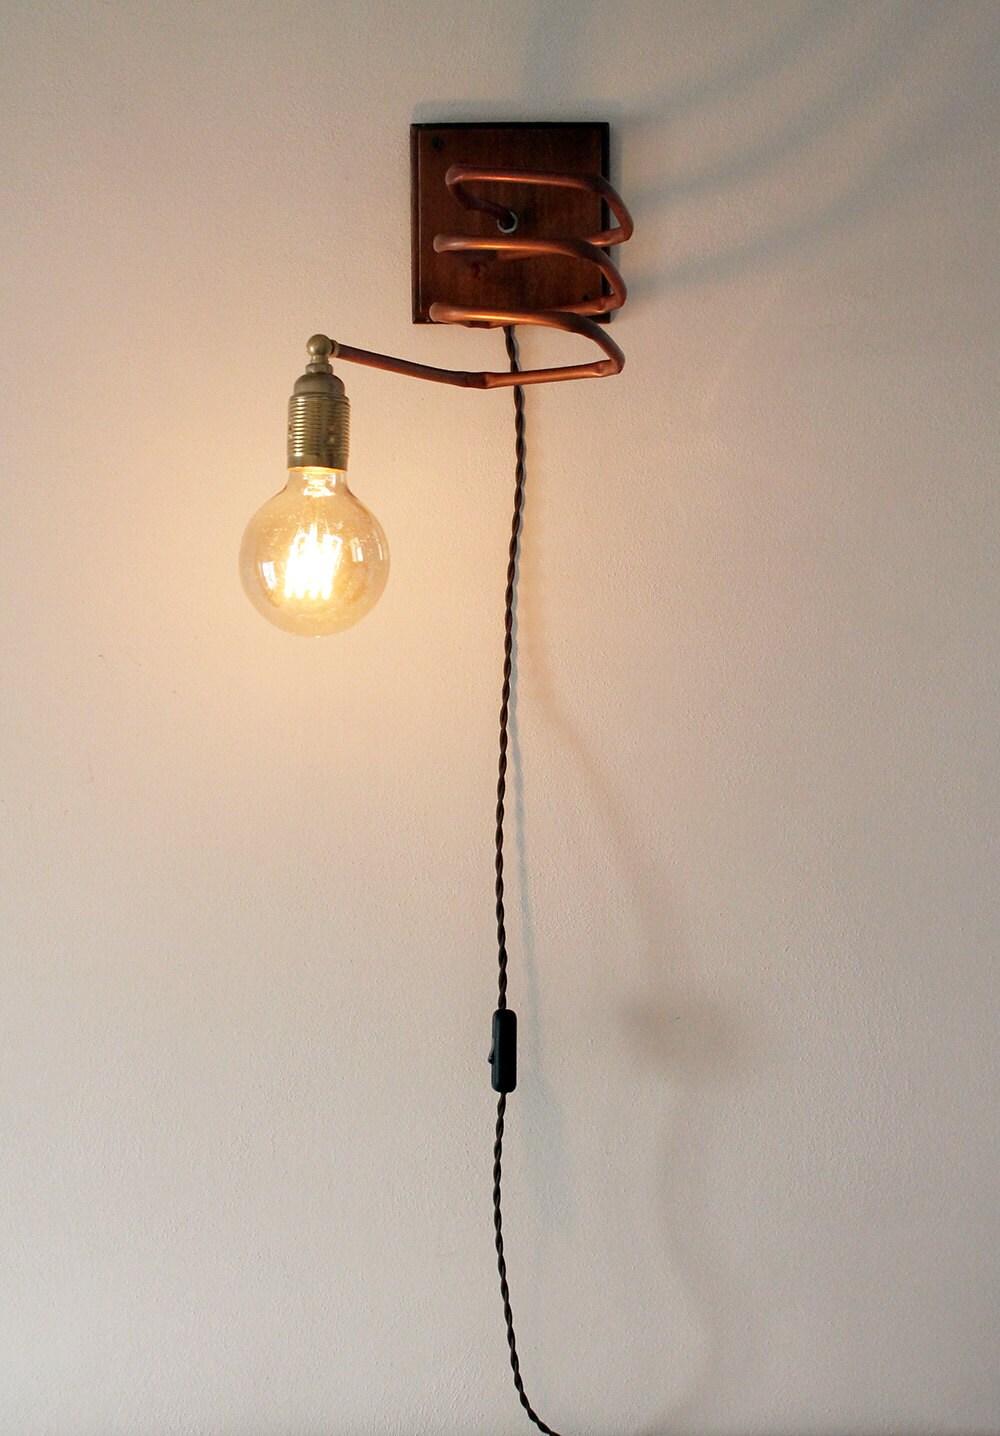 Lampade Artistiche In Rame: Lampade artistiche in rame vetrate belle epoque.